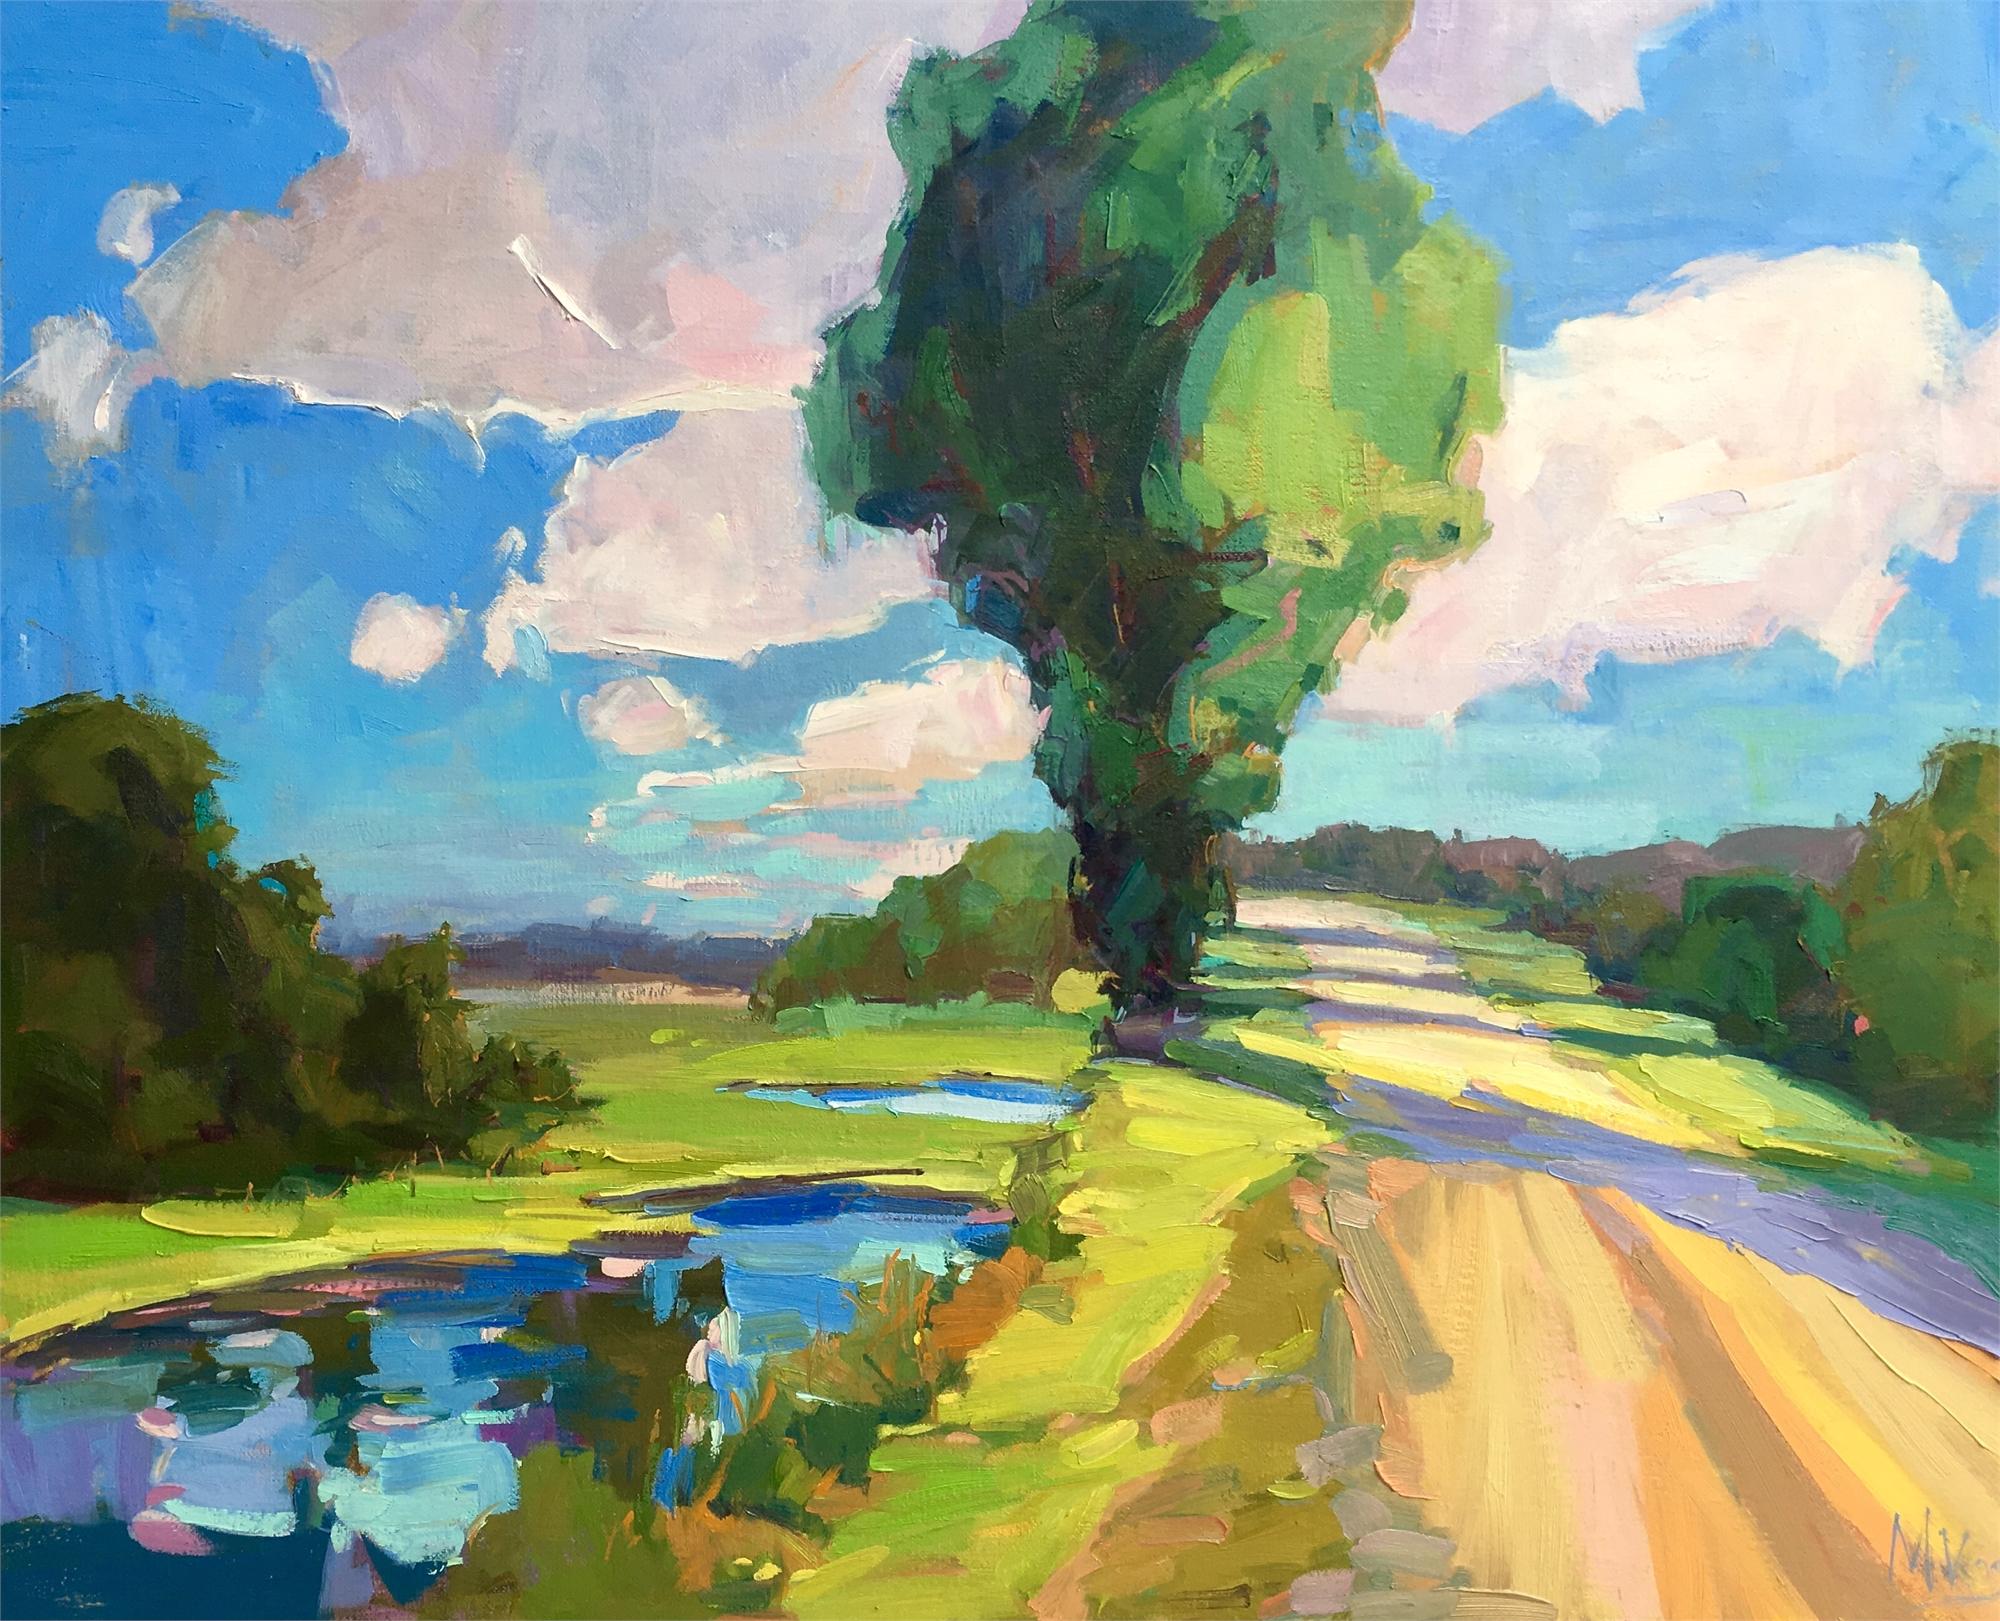 Crossing Paths by Marissa Vogl